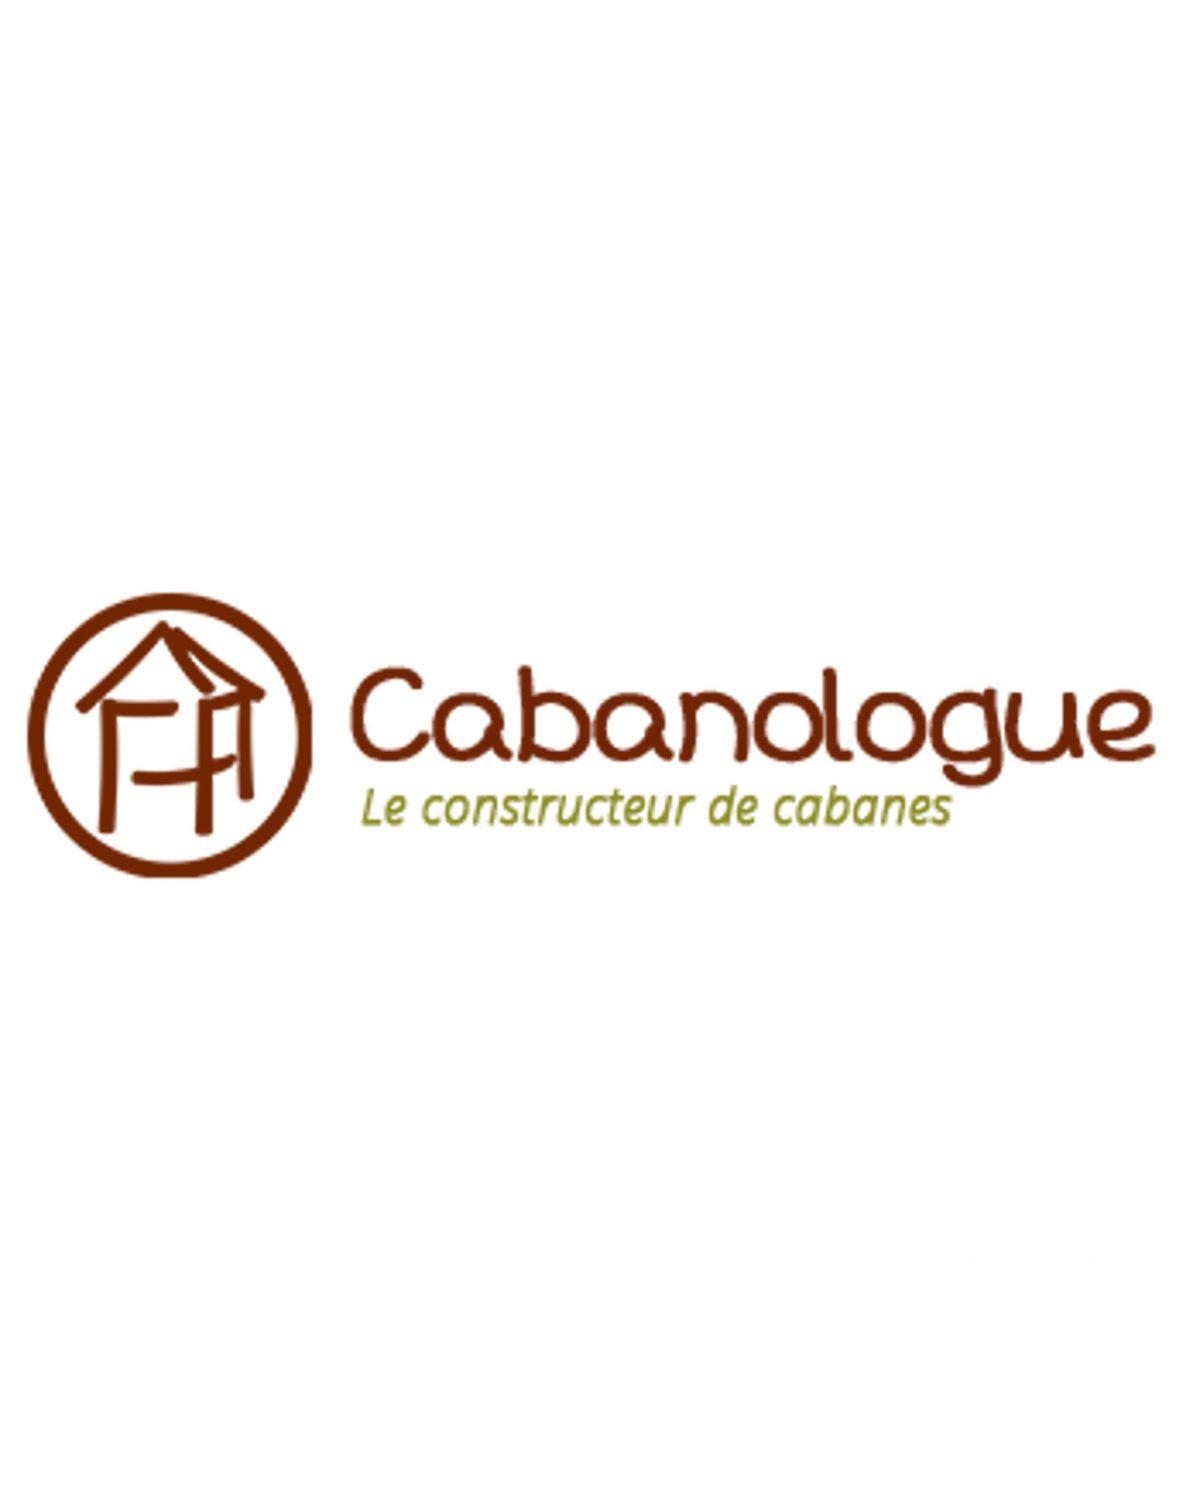 Cabanologue Company – Wooden Huts unusual